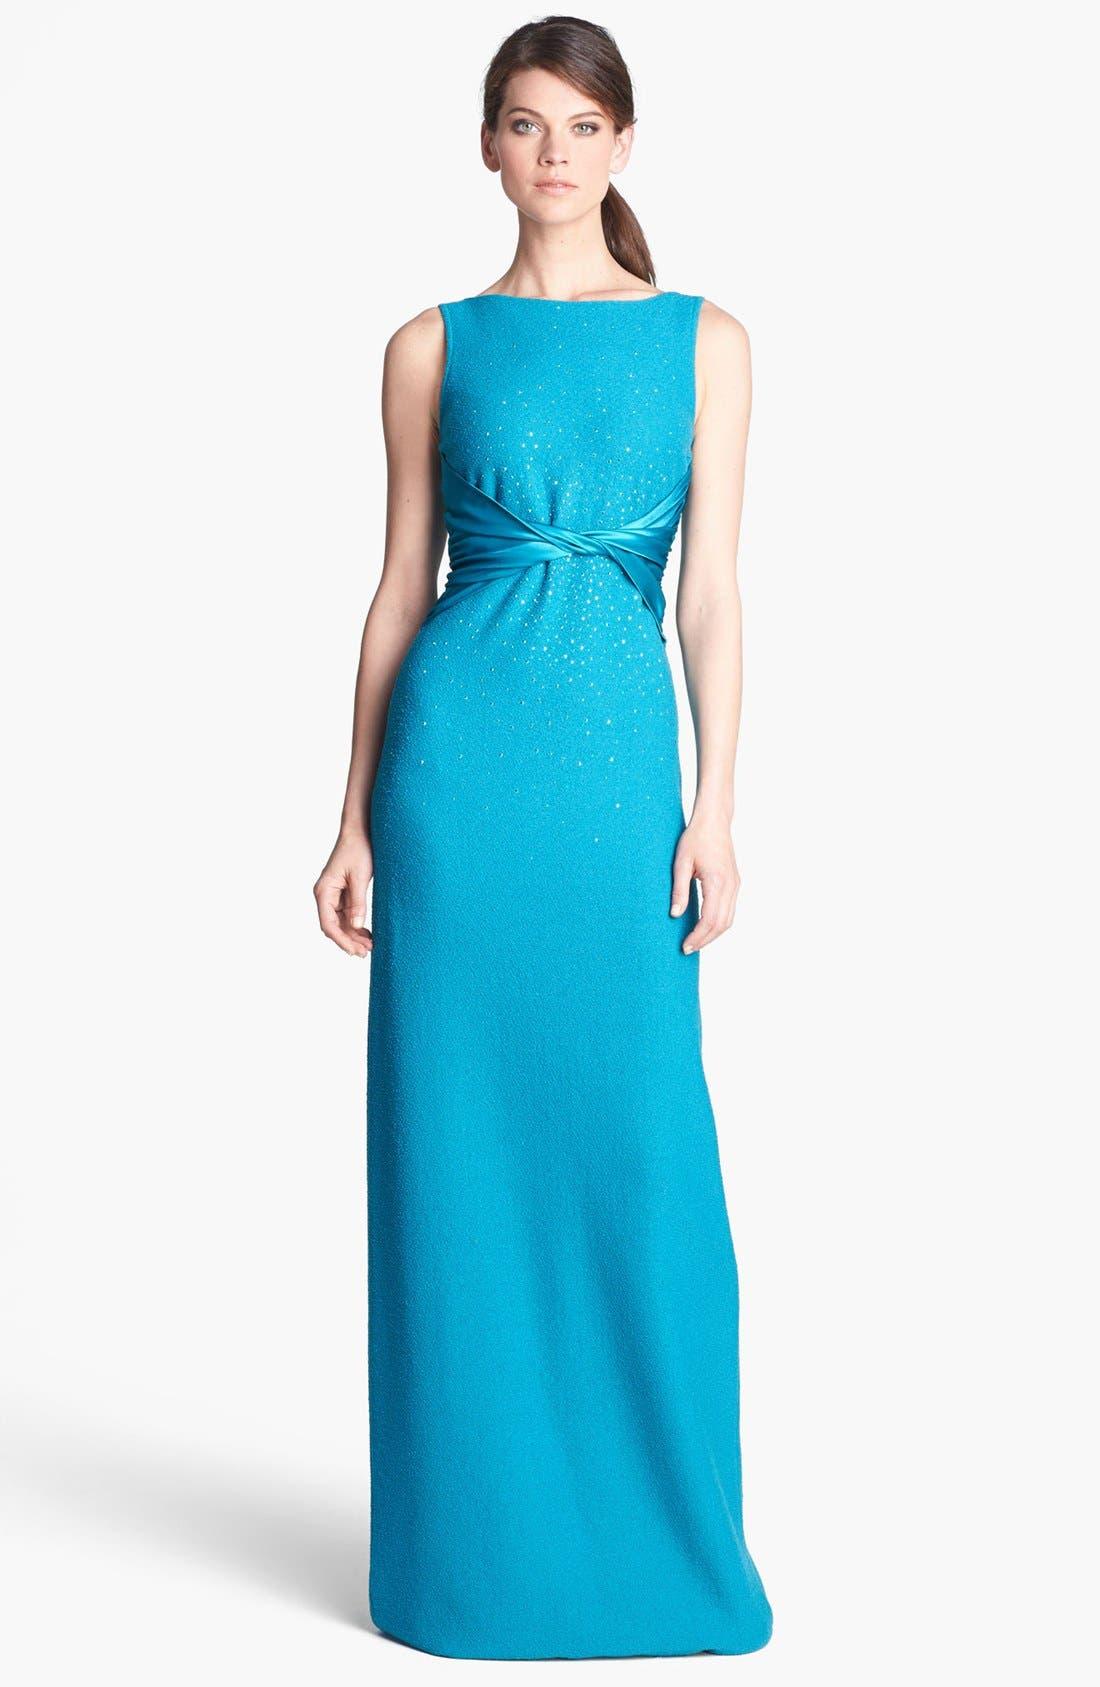 Alternate Image 1 Selected - St. John Collection Sequin Accent Bouclé Knit Gown